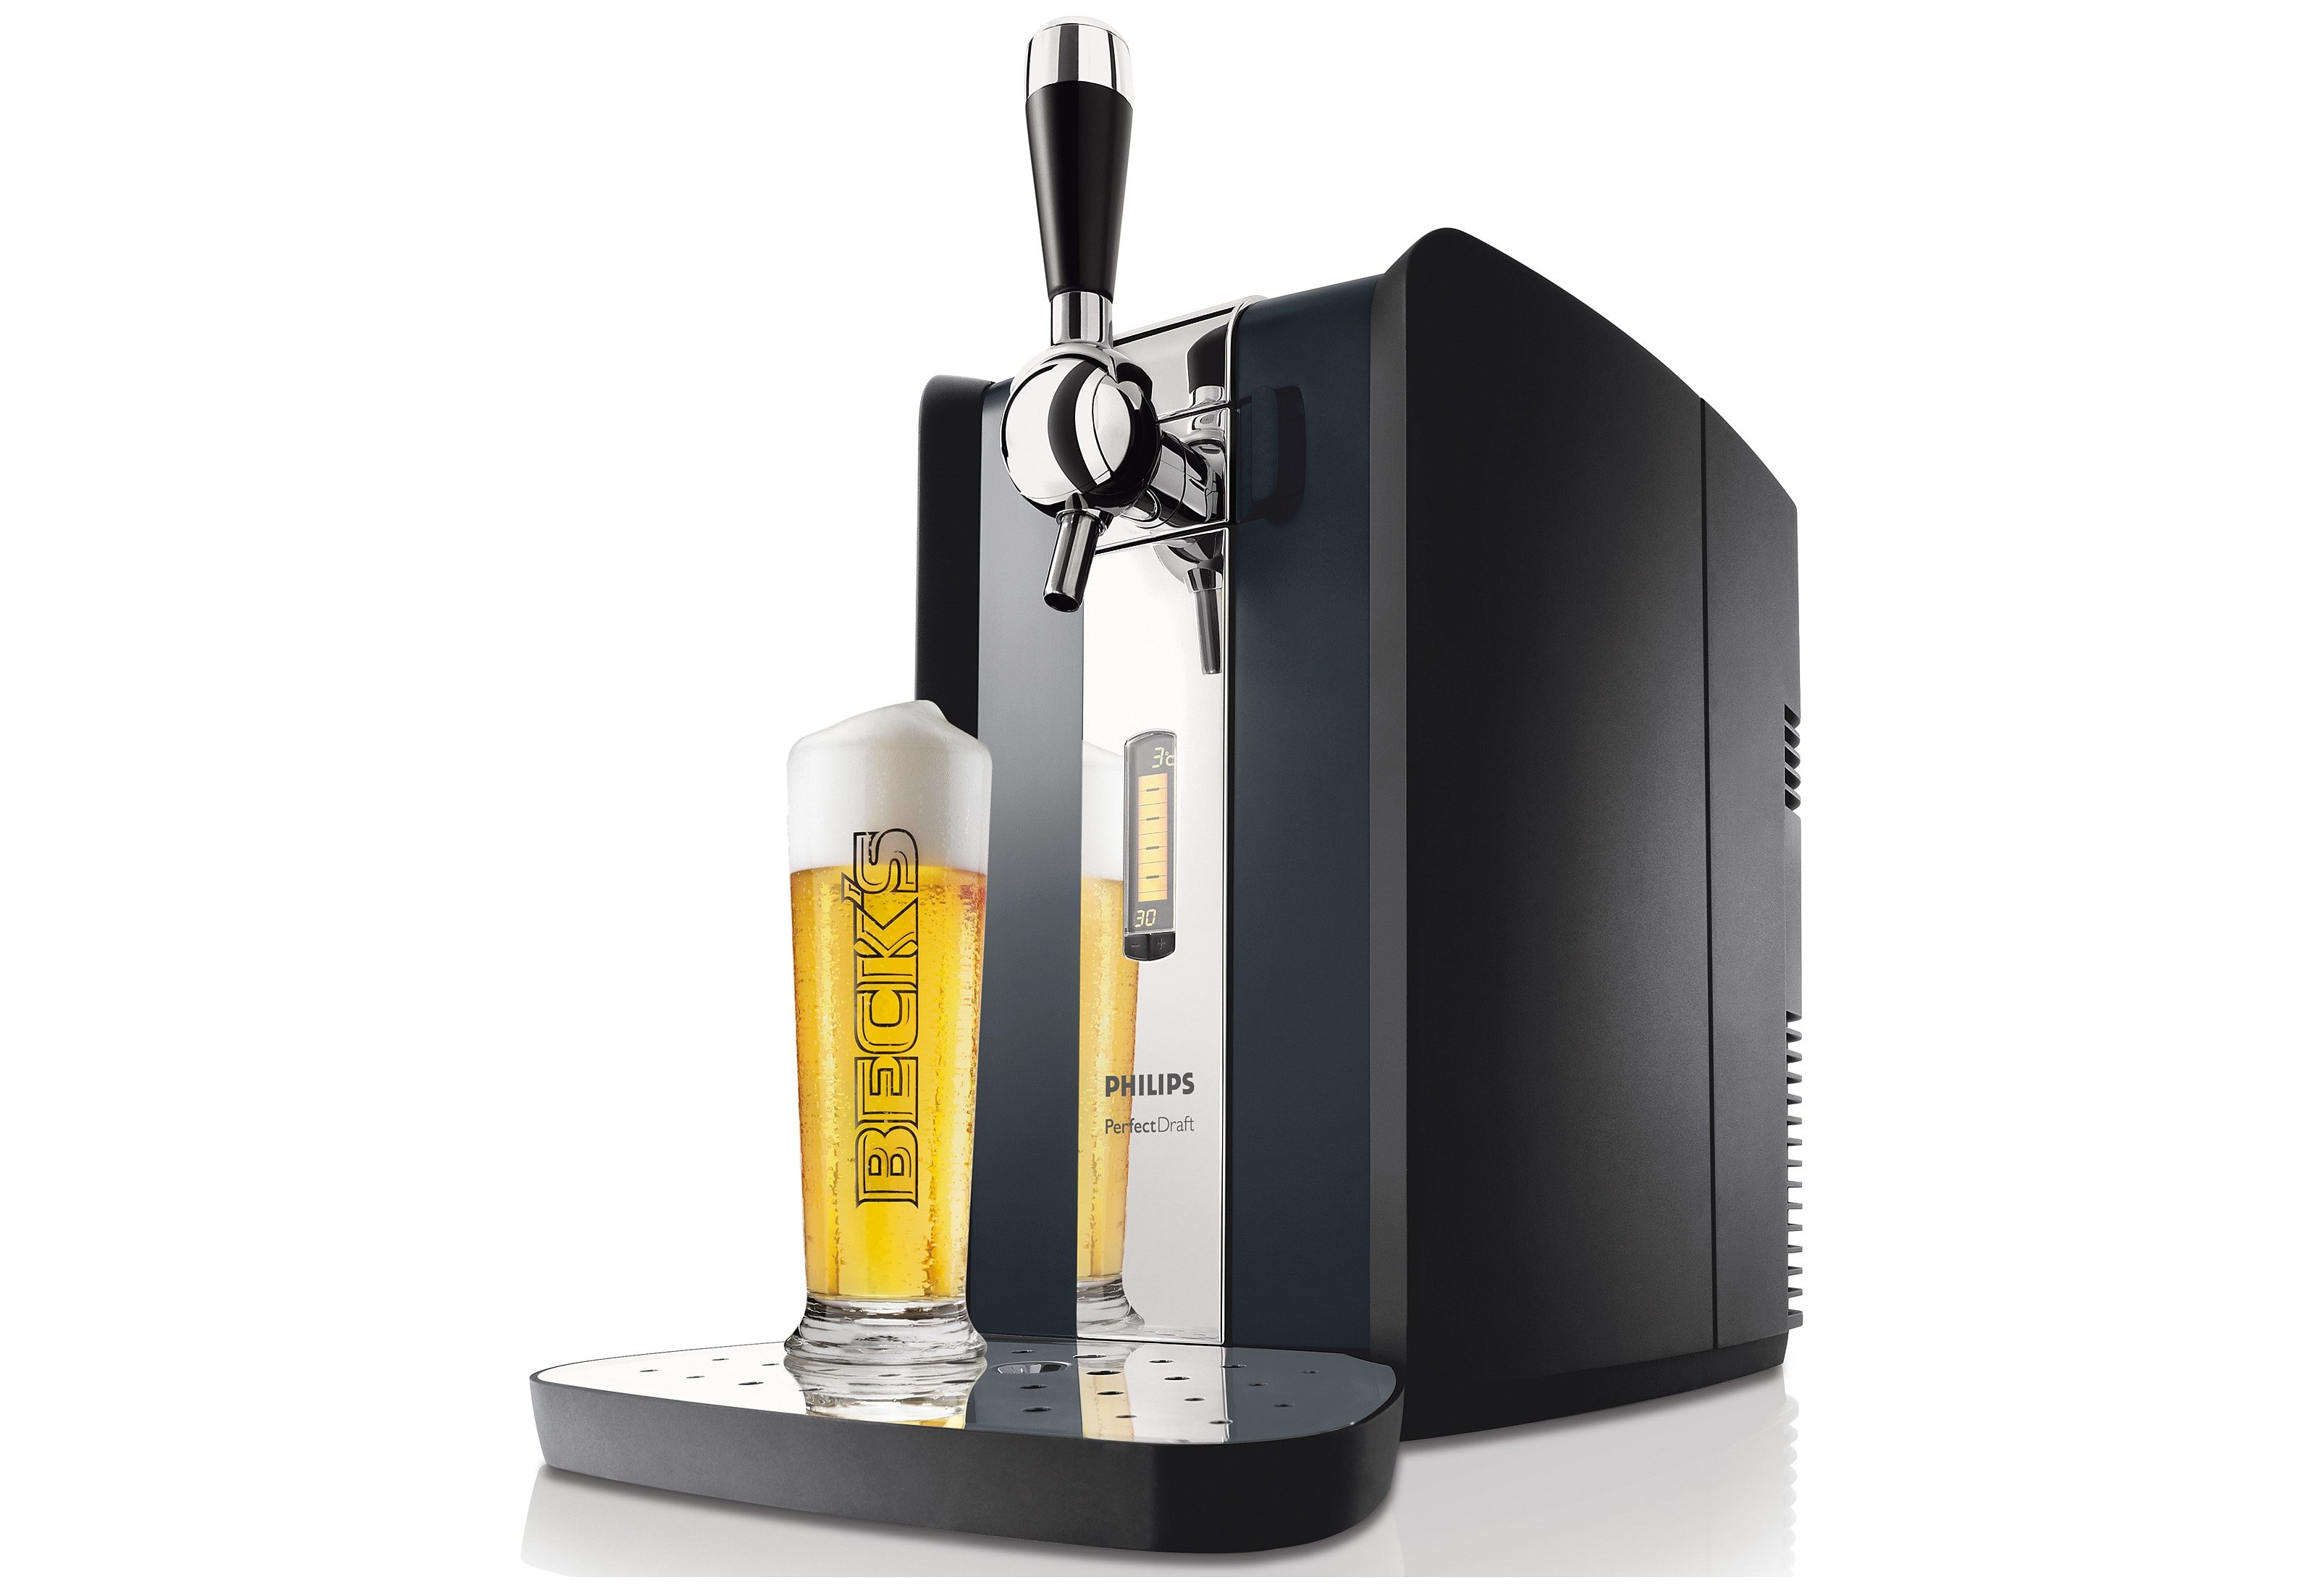 Philips Bierzapfanlage Perfect Draft HD3620, 30 Tage lang frisches Bier